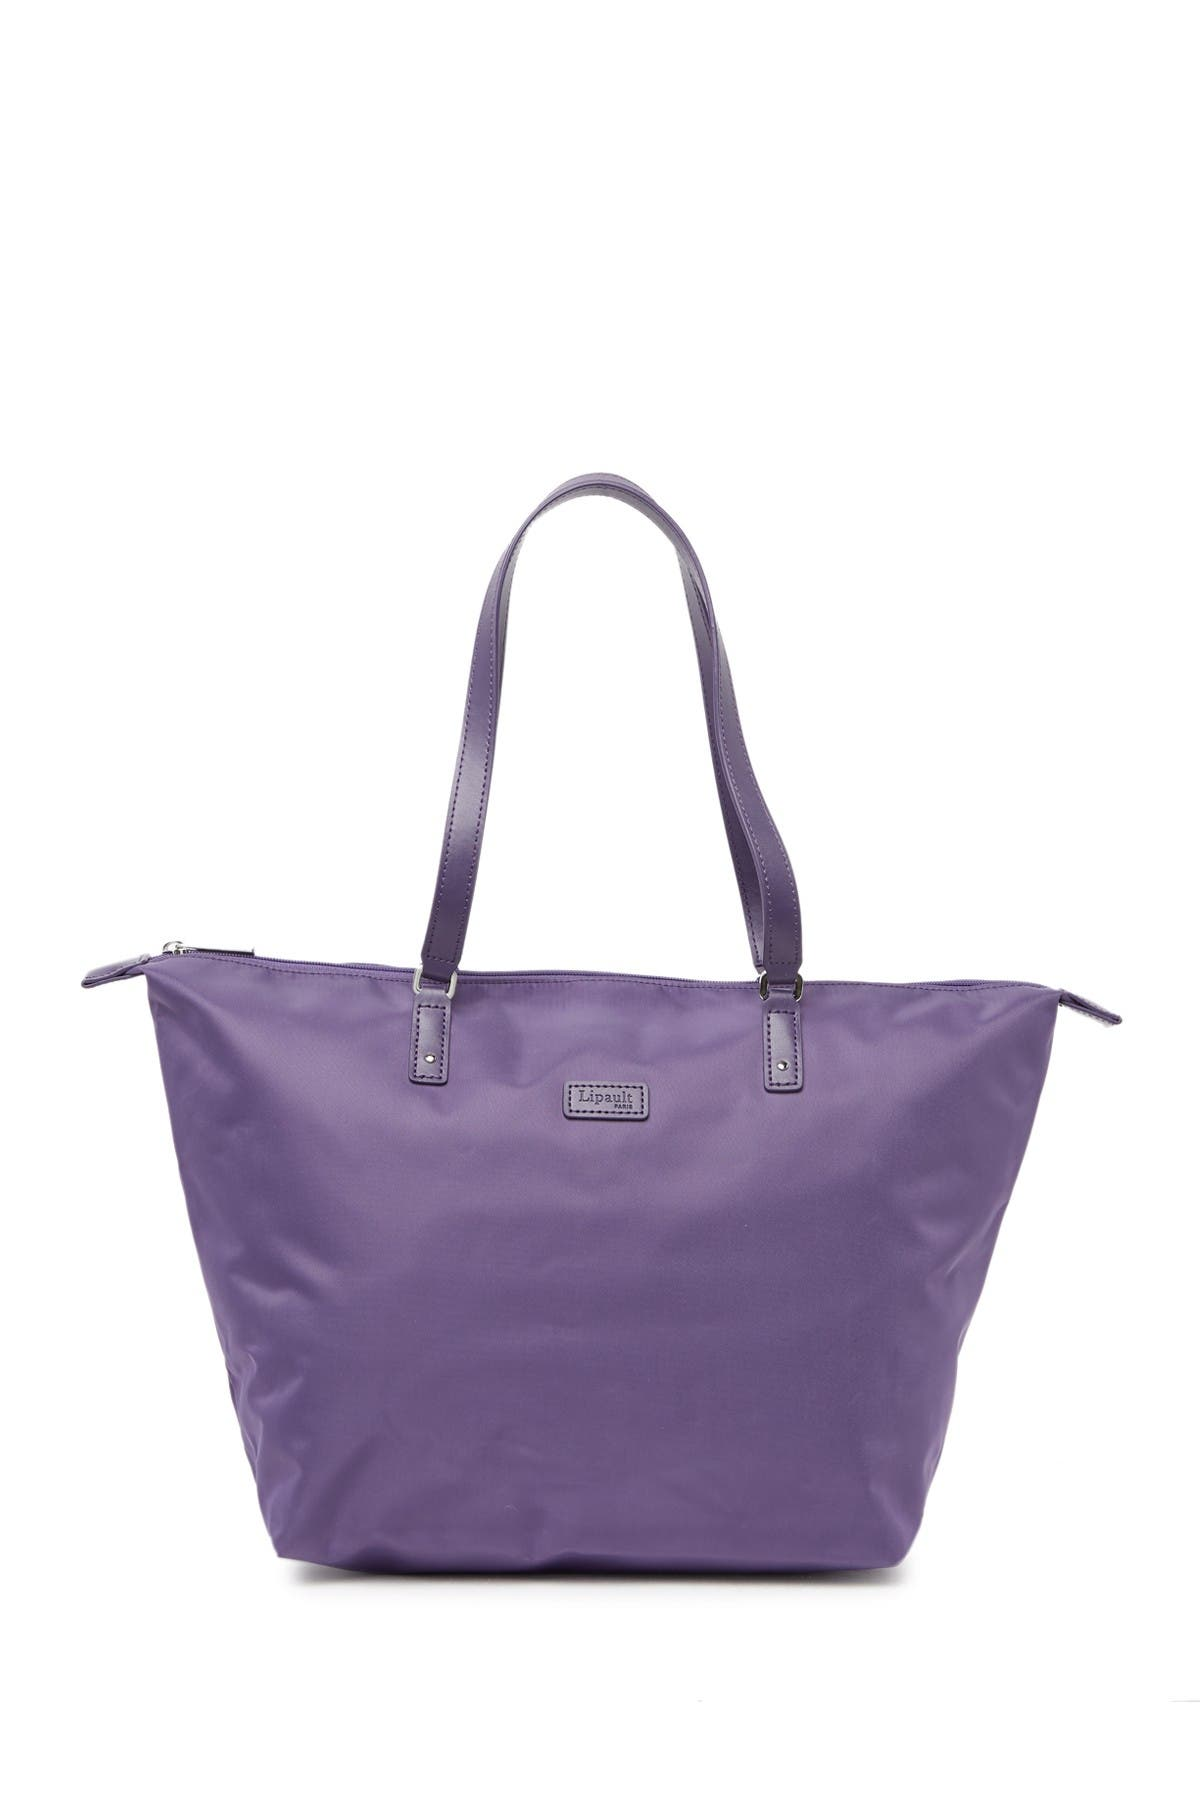 Image of Lipault Nylon Tote Bag